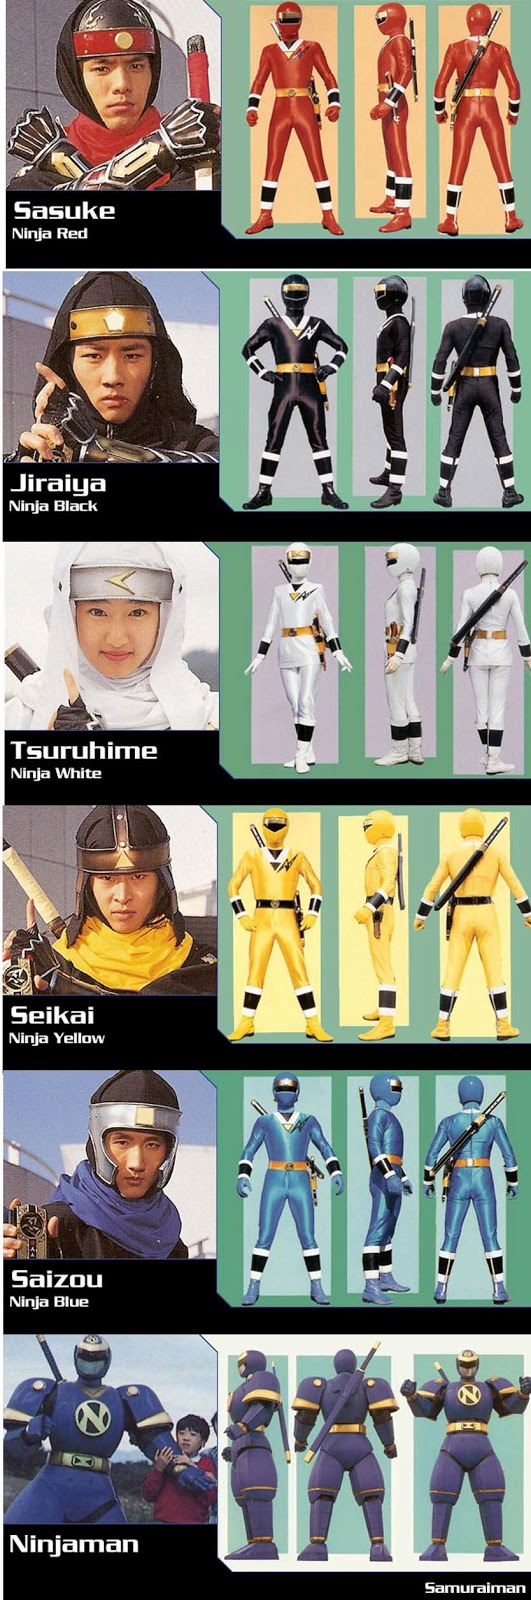 Ninja sentai kakuranger episode 39 / Imdb party down south